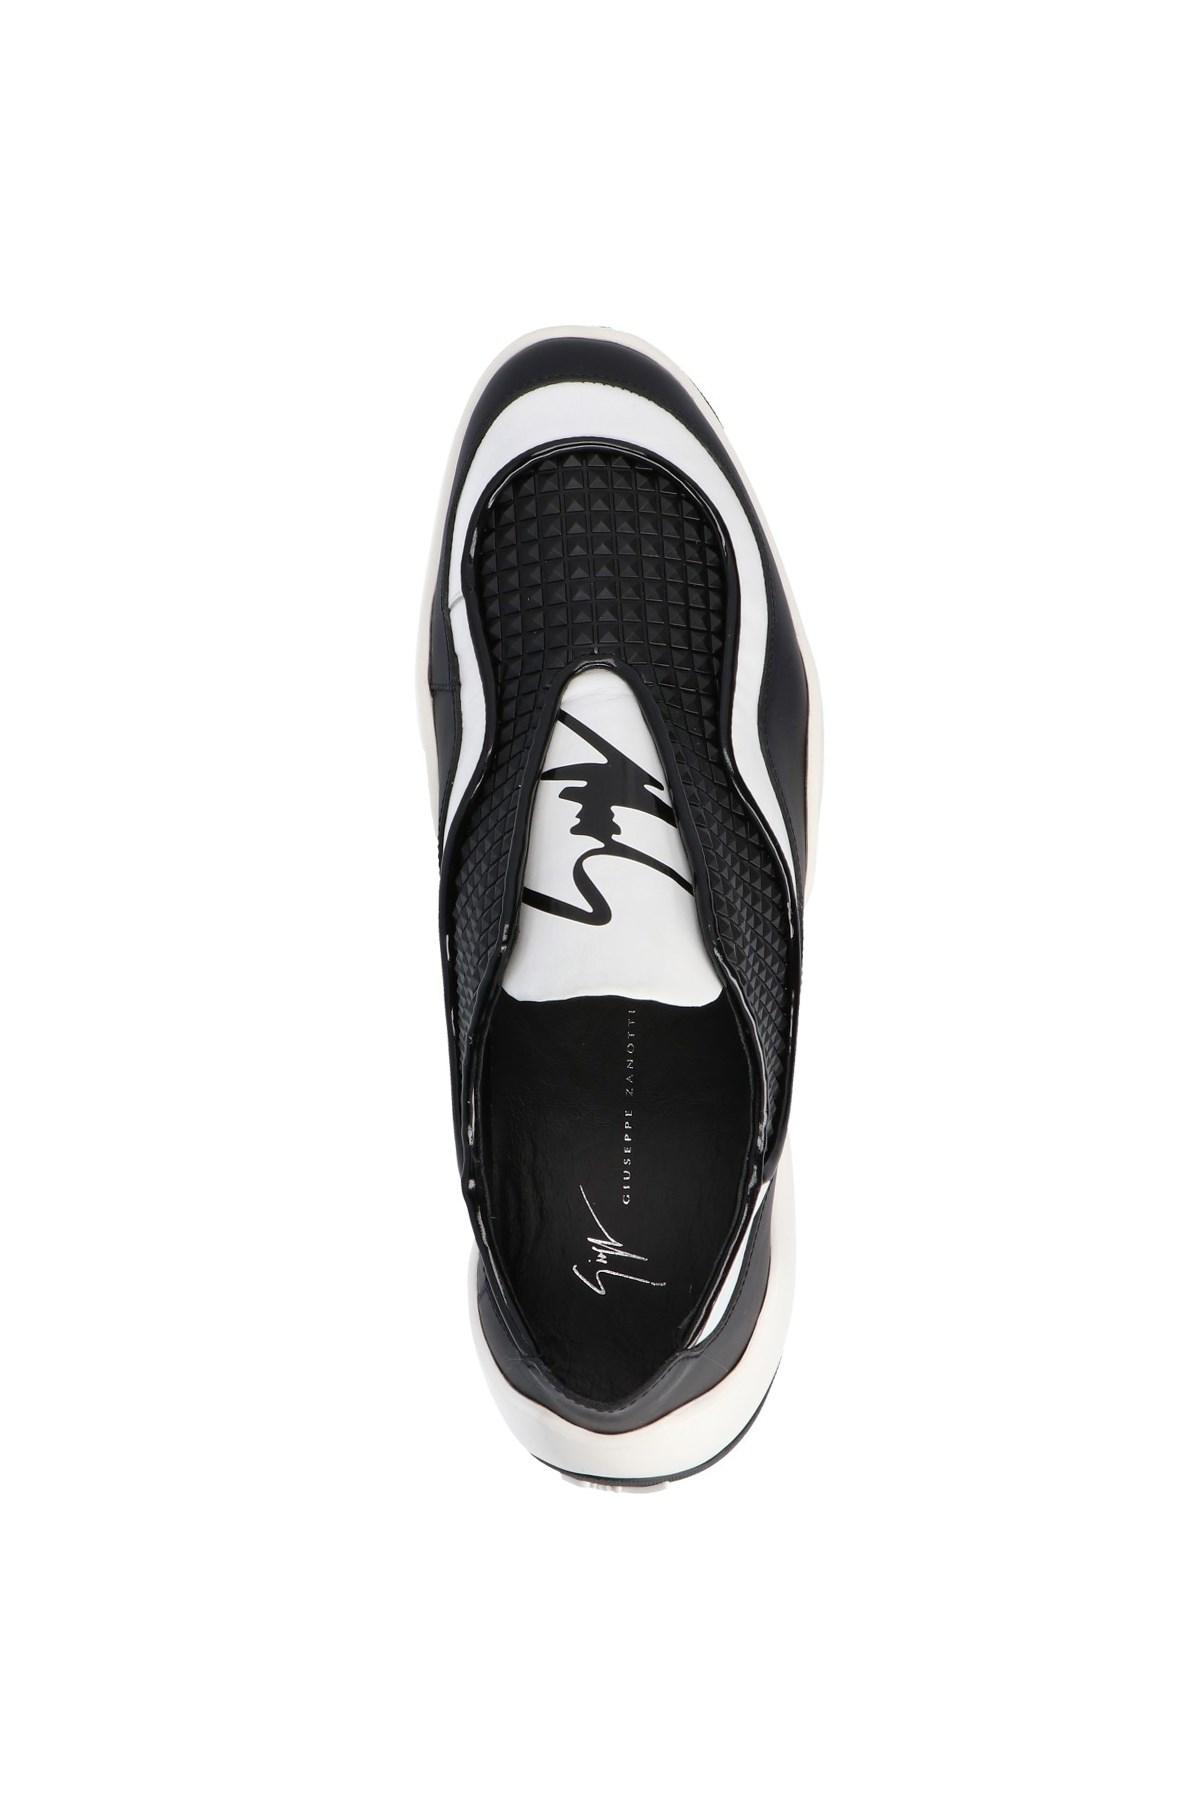 2a34cfa81534e giuseppe zanotti 'Light jump' sneakers available on julian-fashion ...